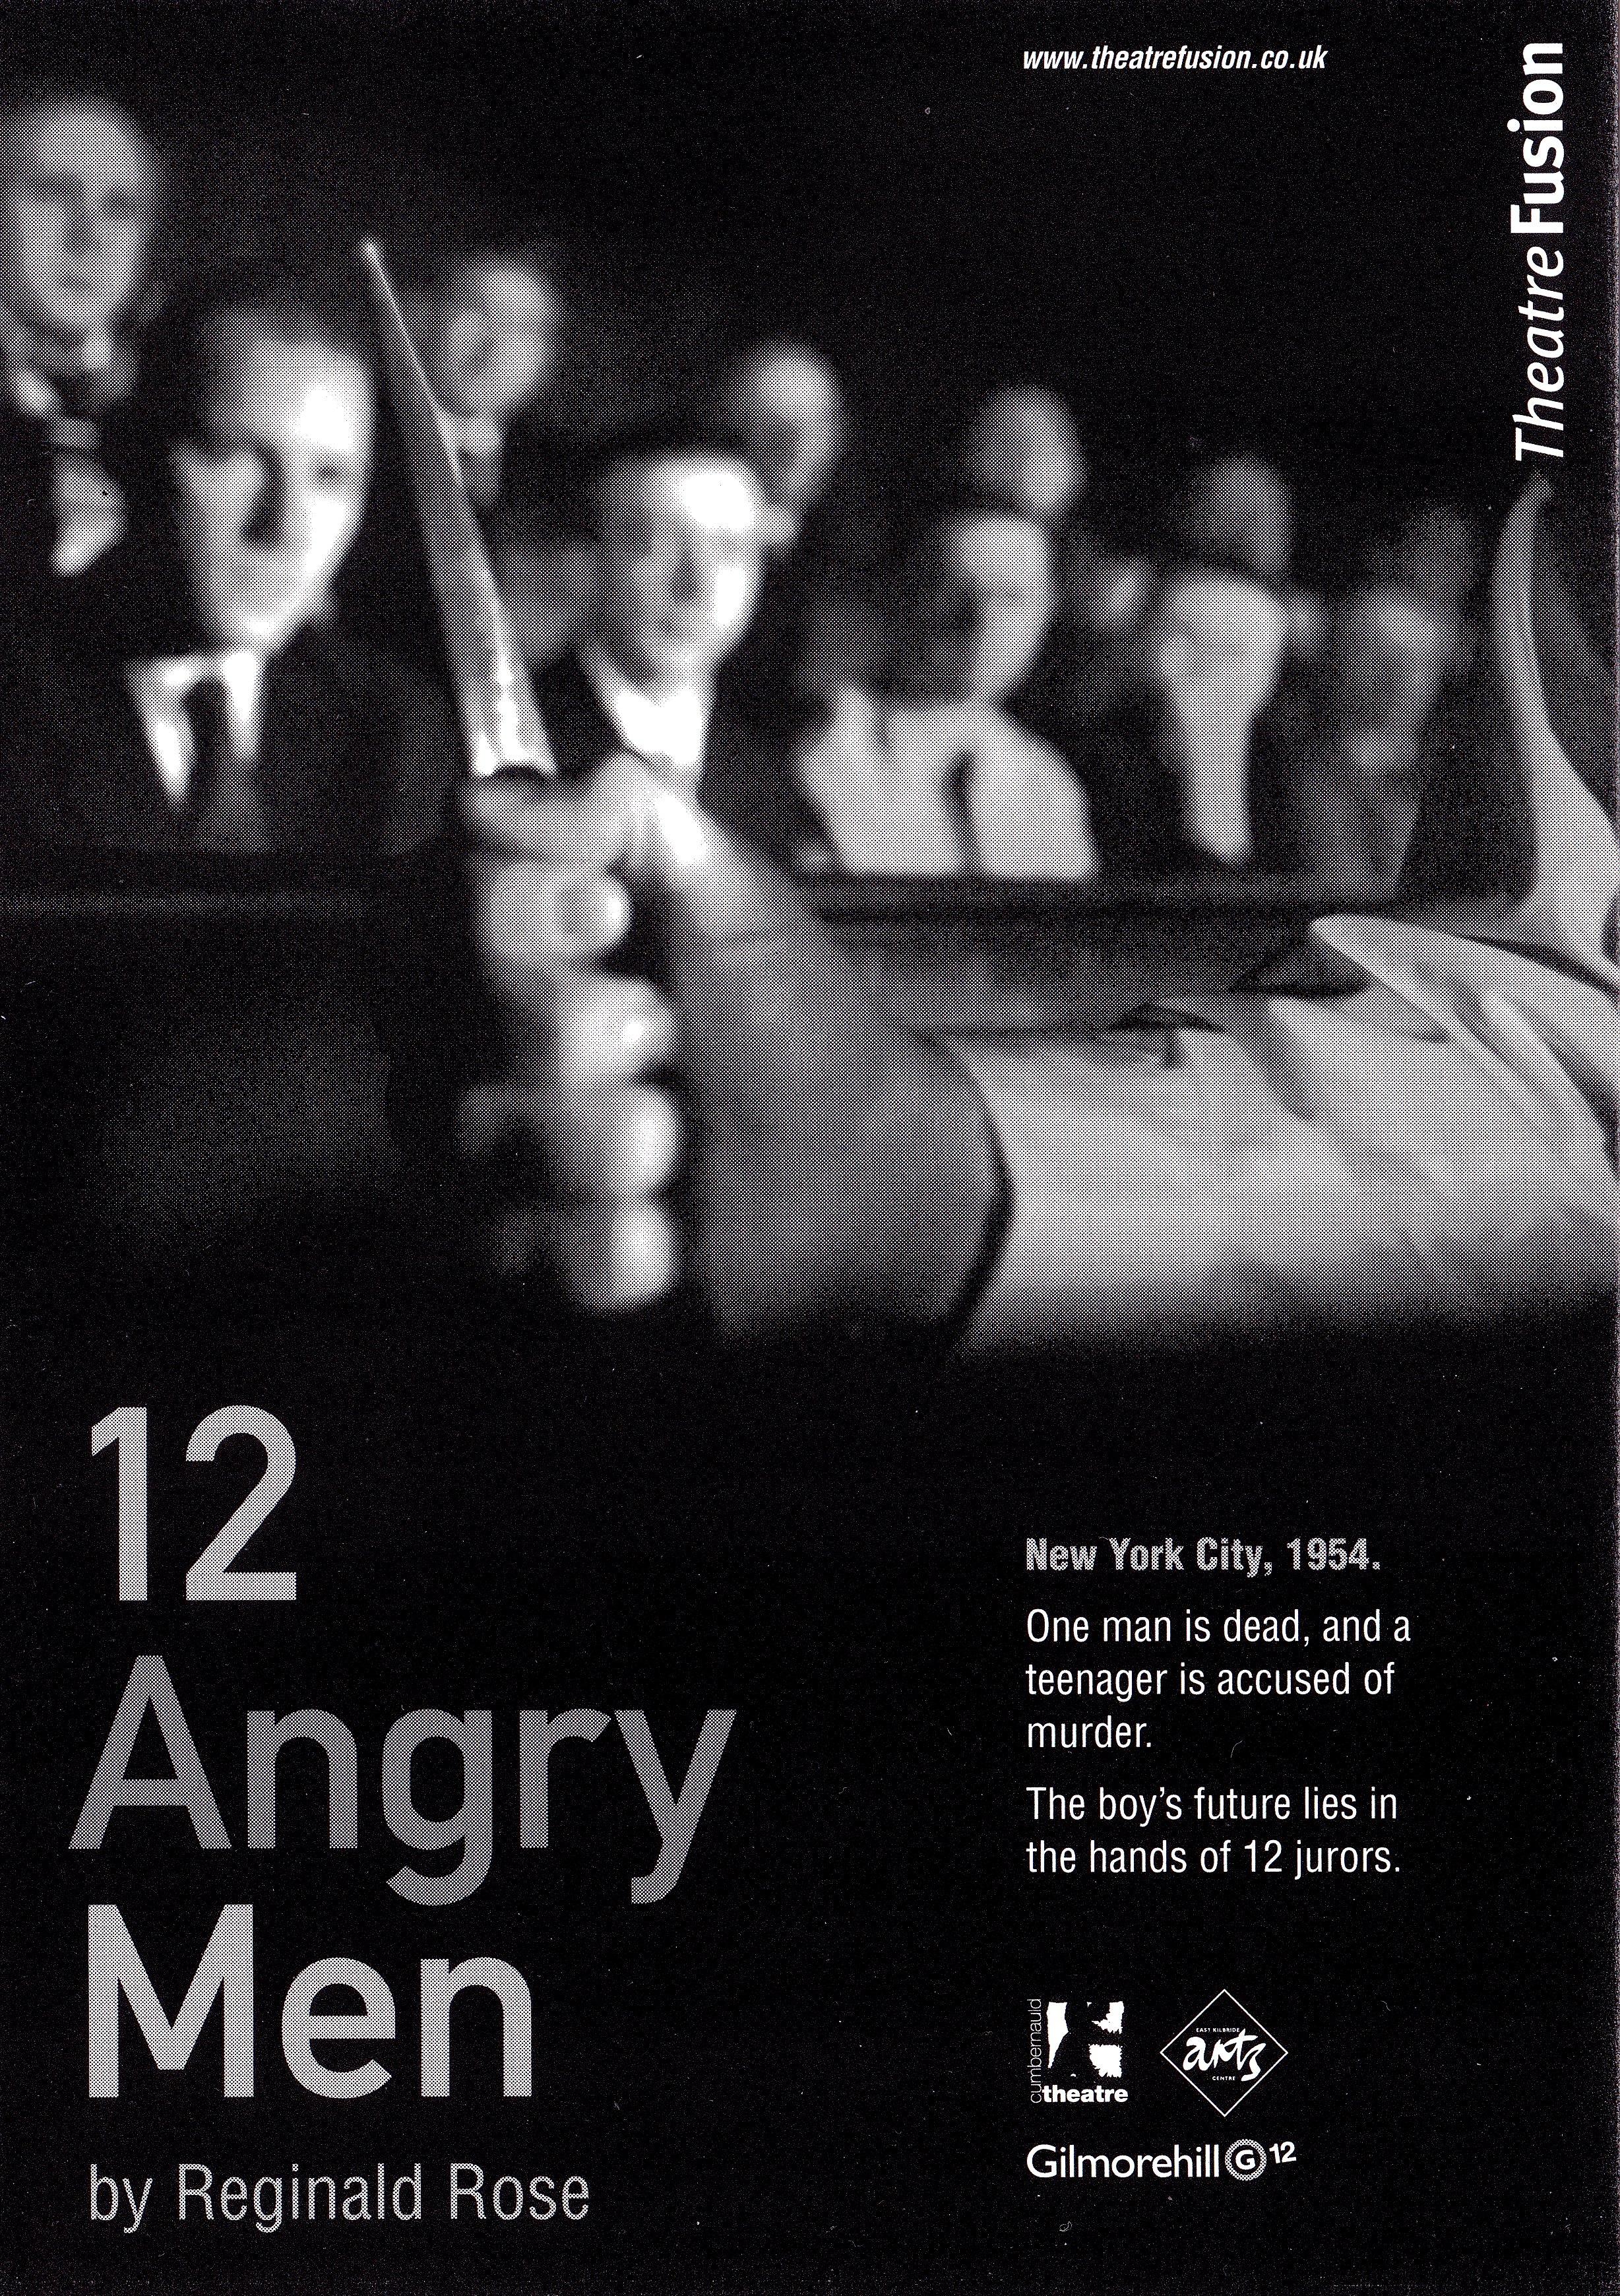 View The Movie 12 Angry Men Orion Nova Pr